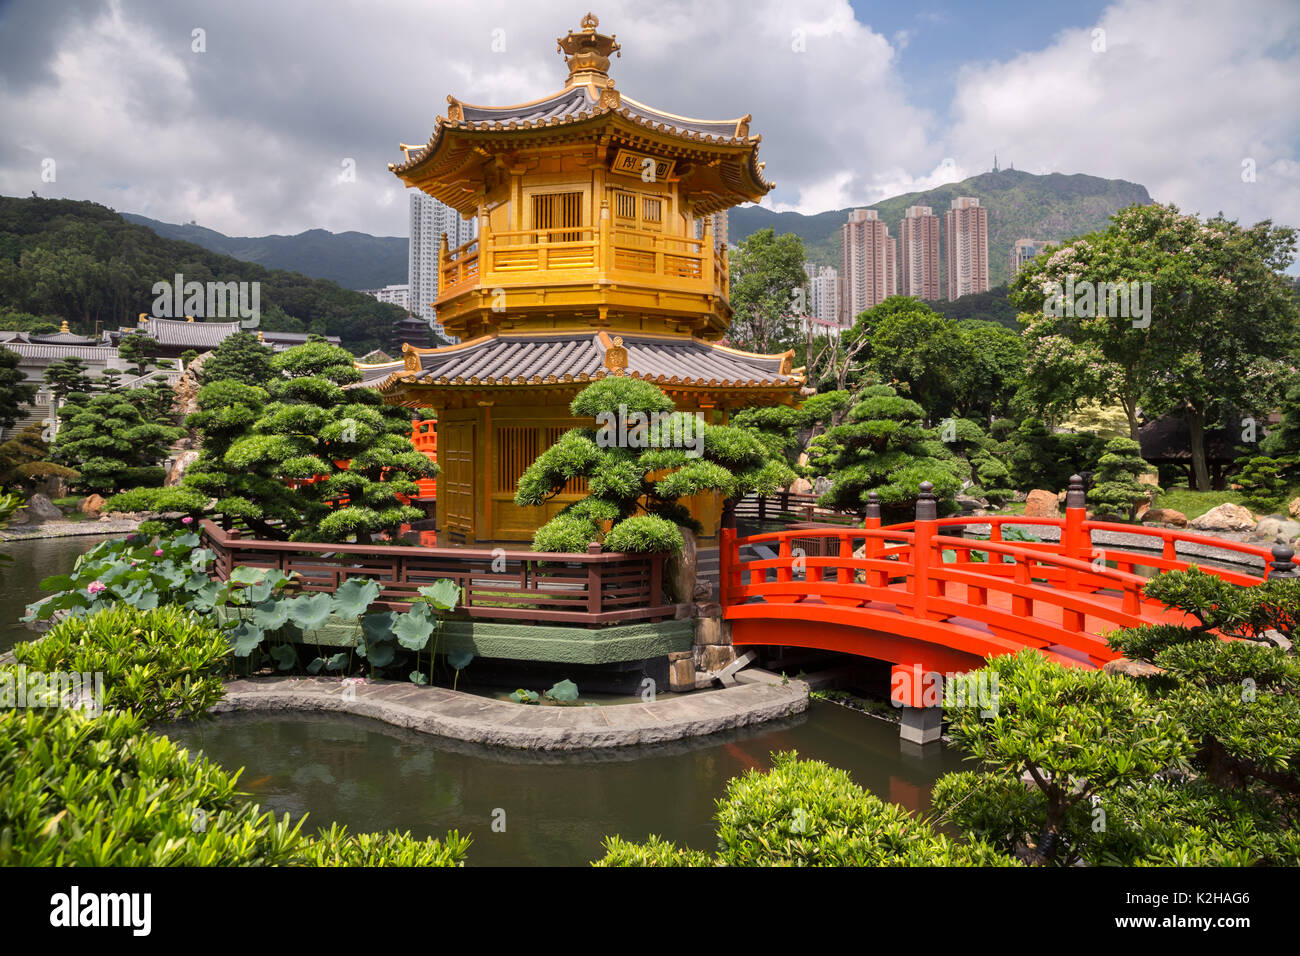 Tempio di perfezione assoluta in Hong Kong Immagini Stock